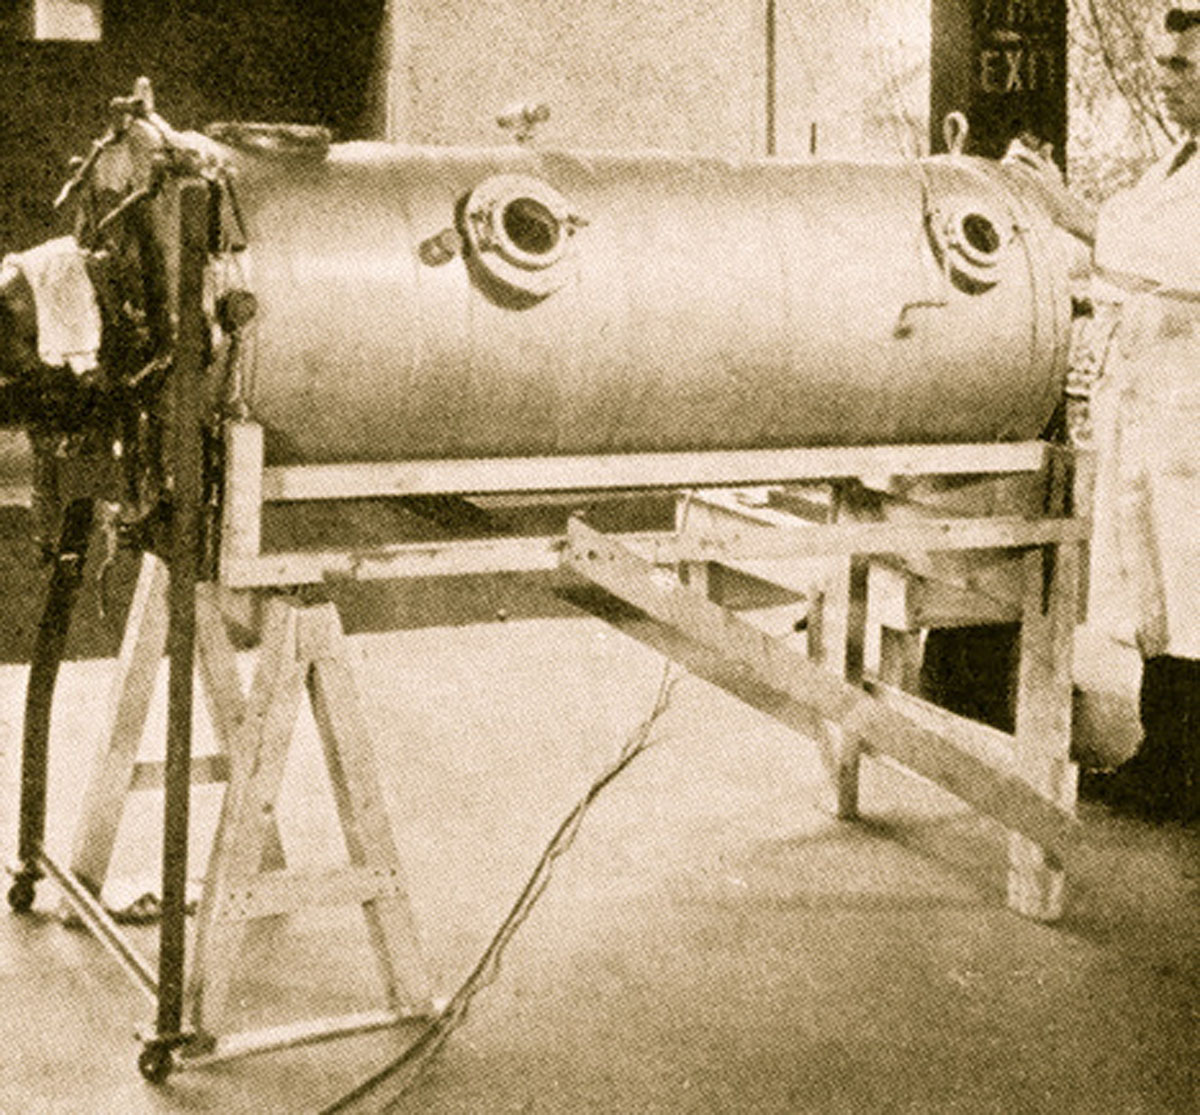 1929 Drinker & Shaw's Respirator